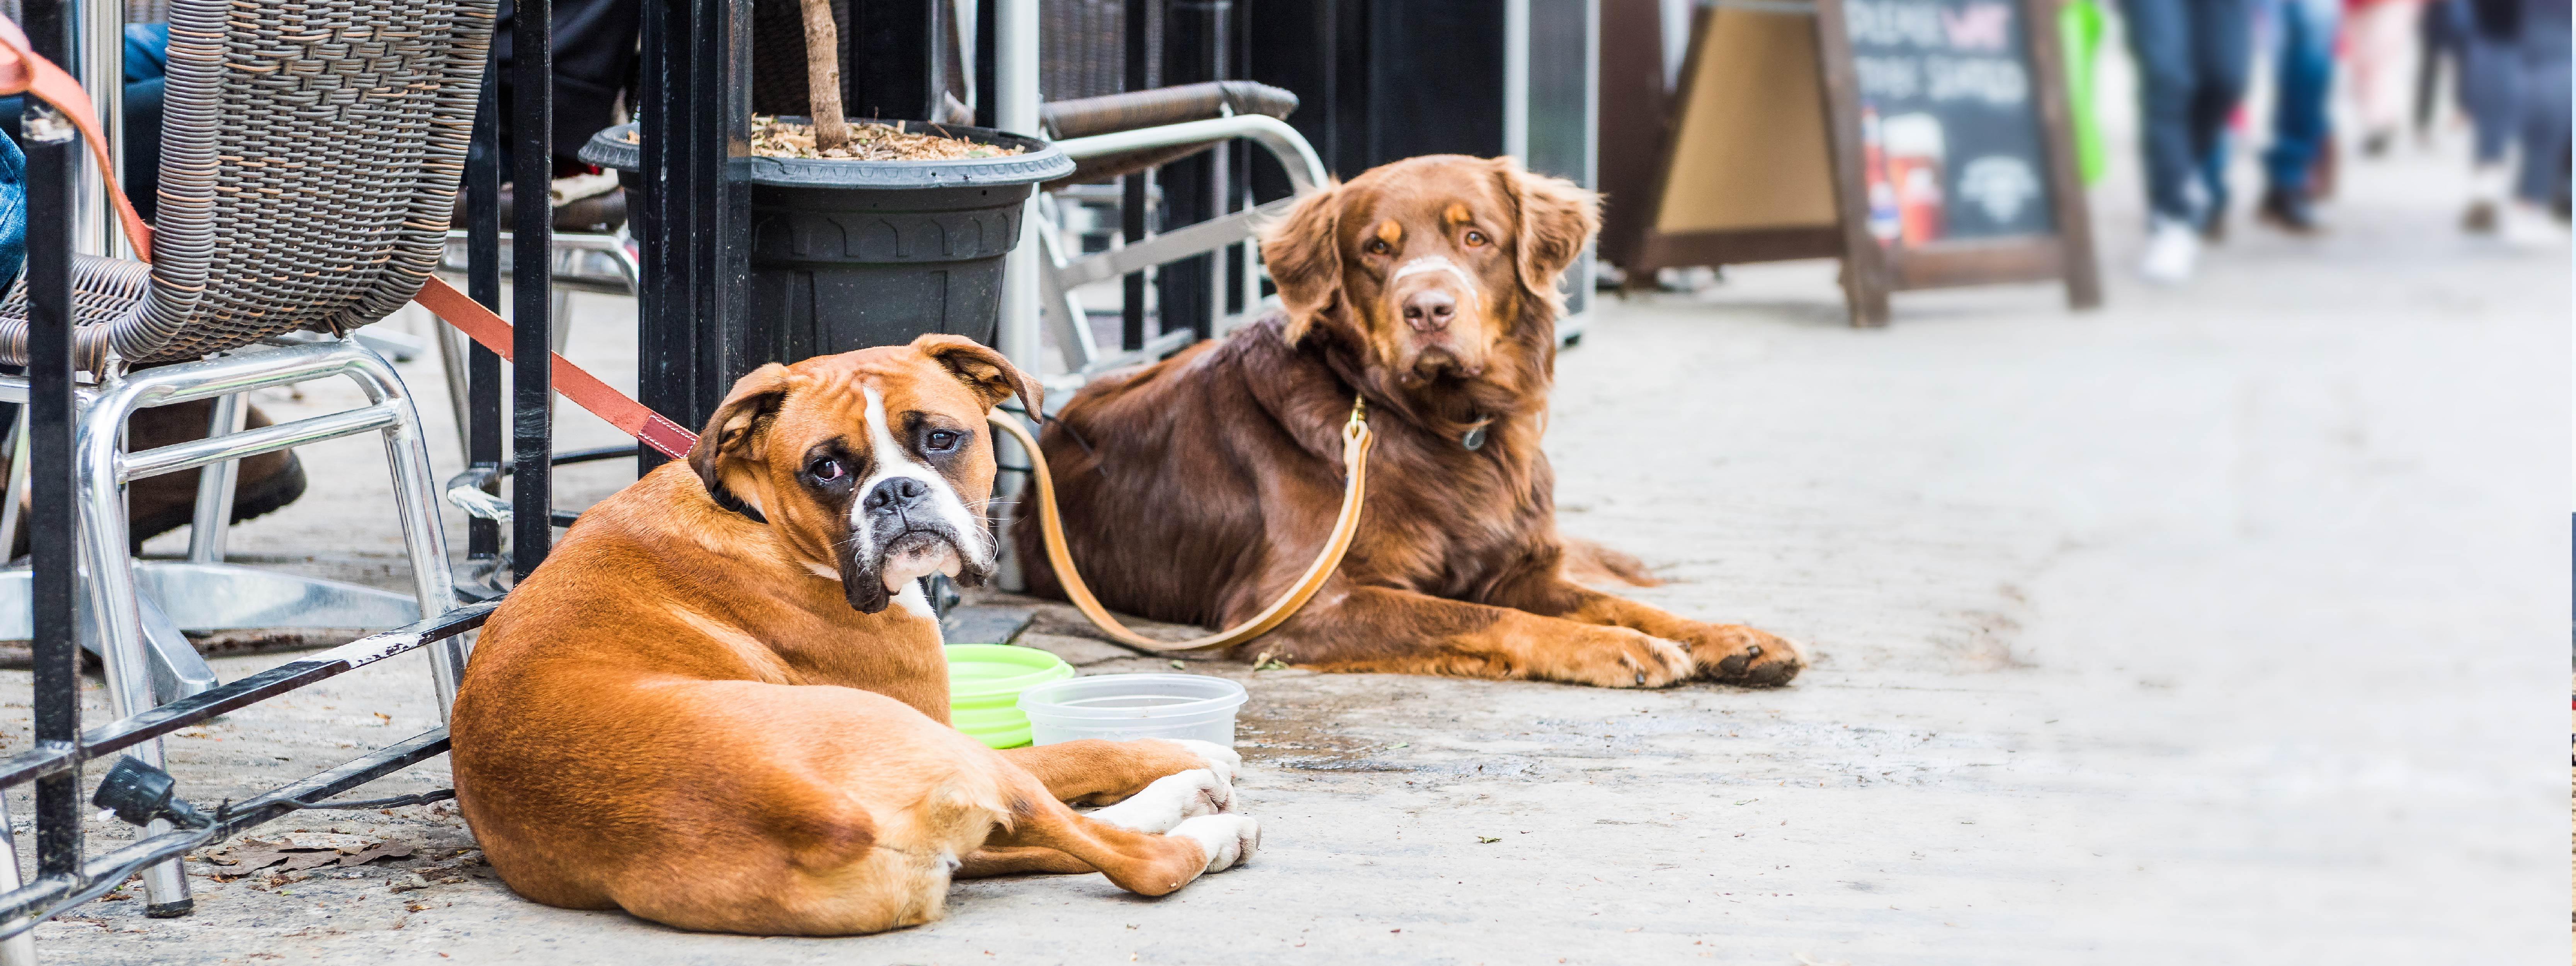 5 San Francisco Neighborhoods With Dog-Friendly Restaurants